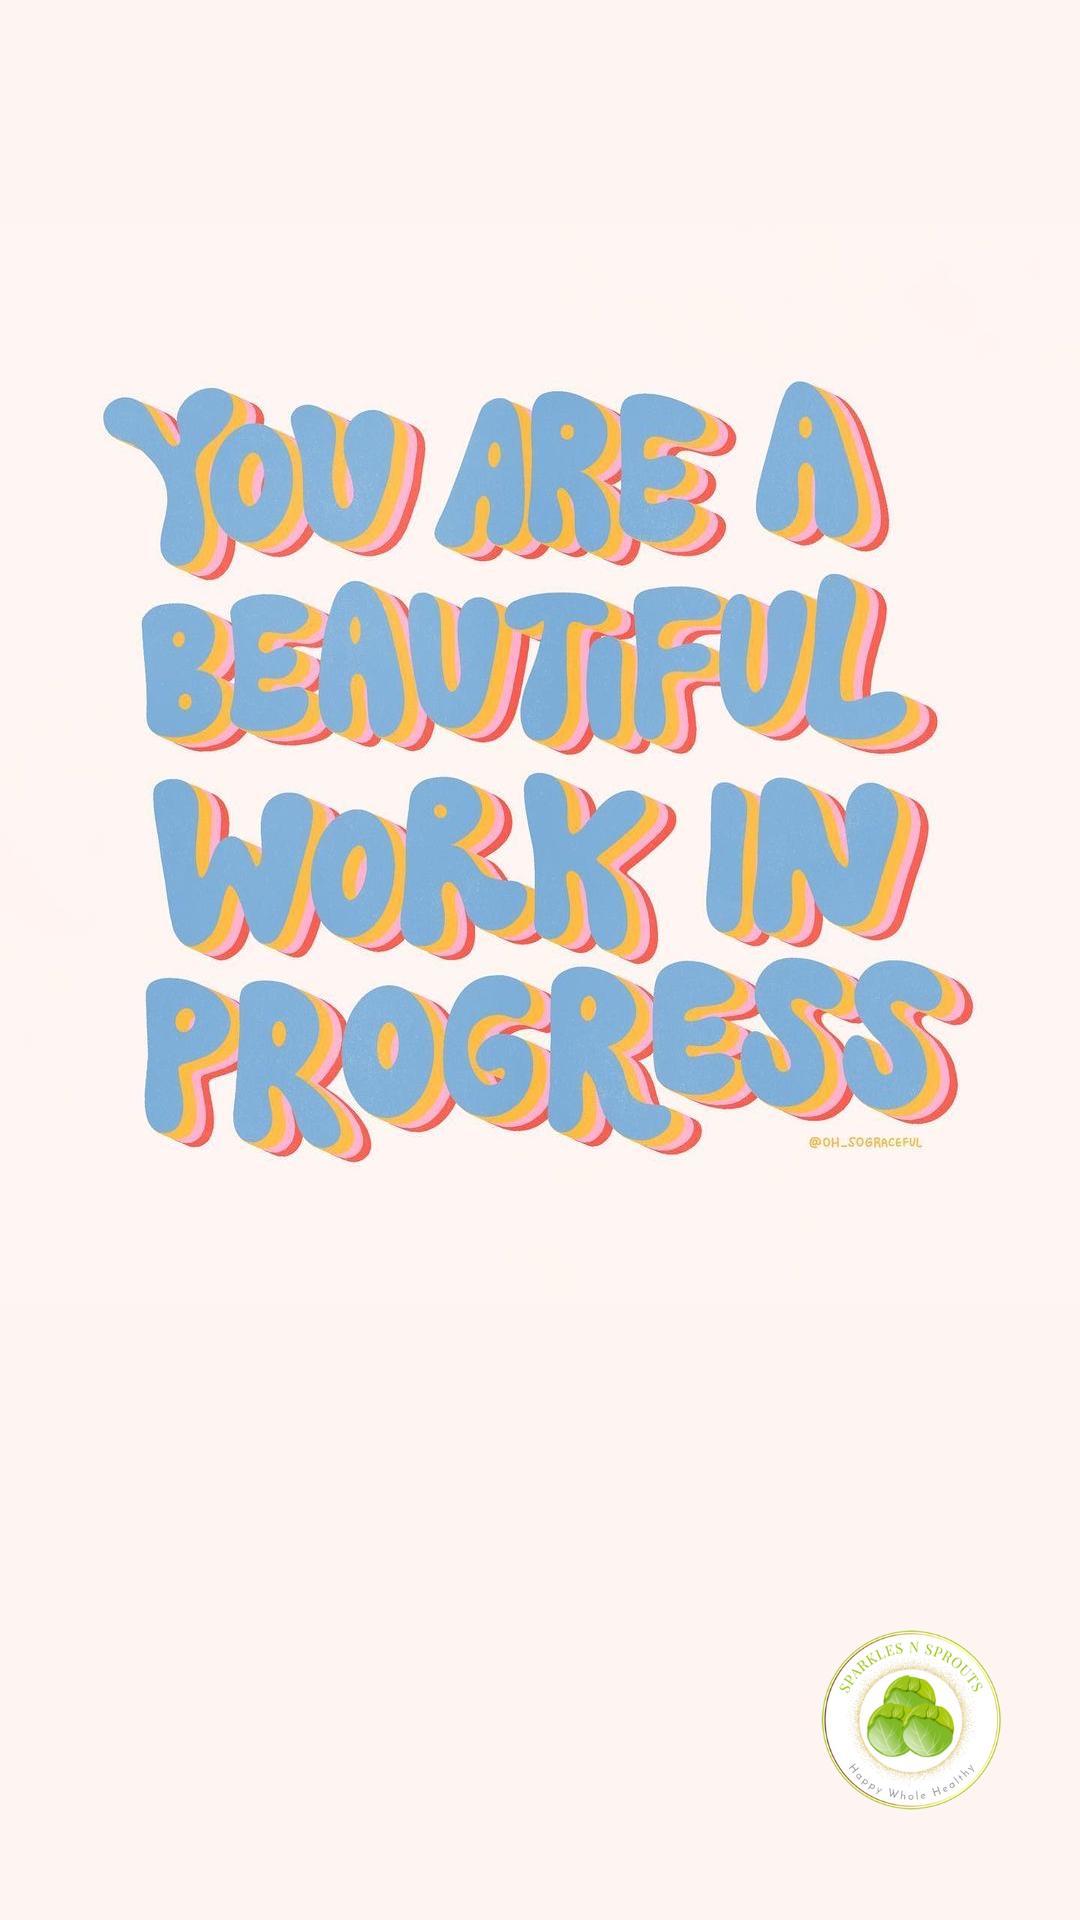 beautiful-work-in-progress-s